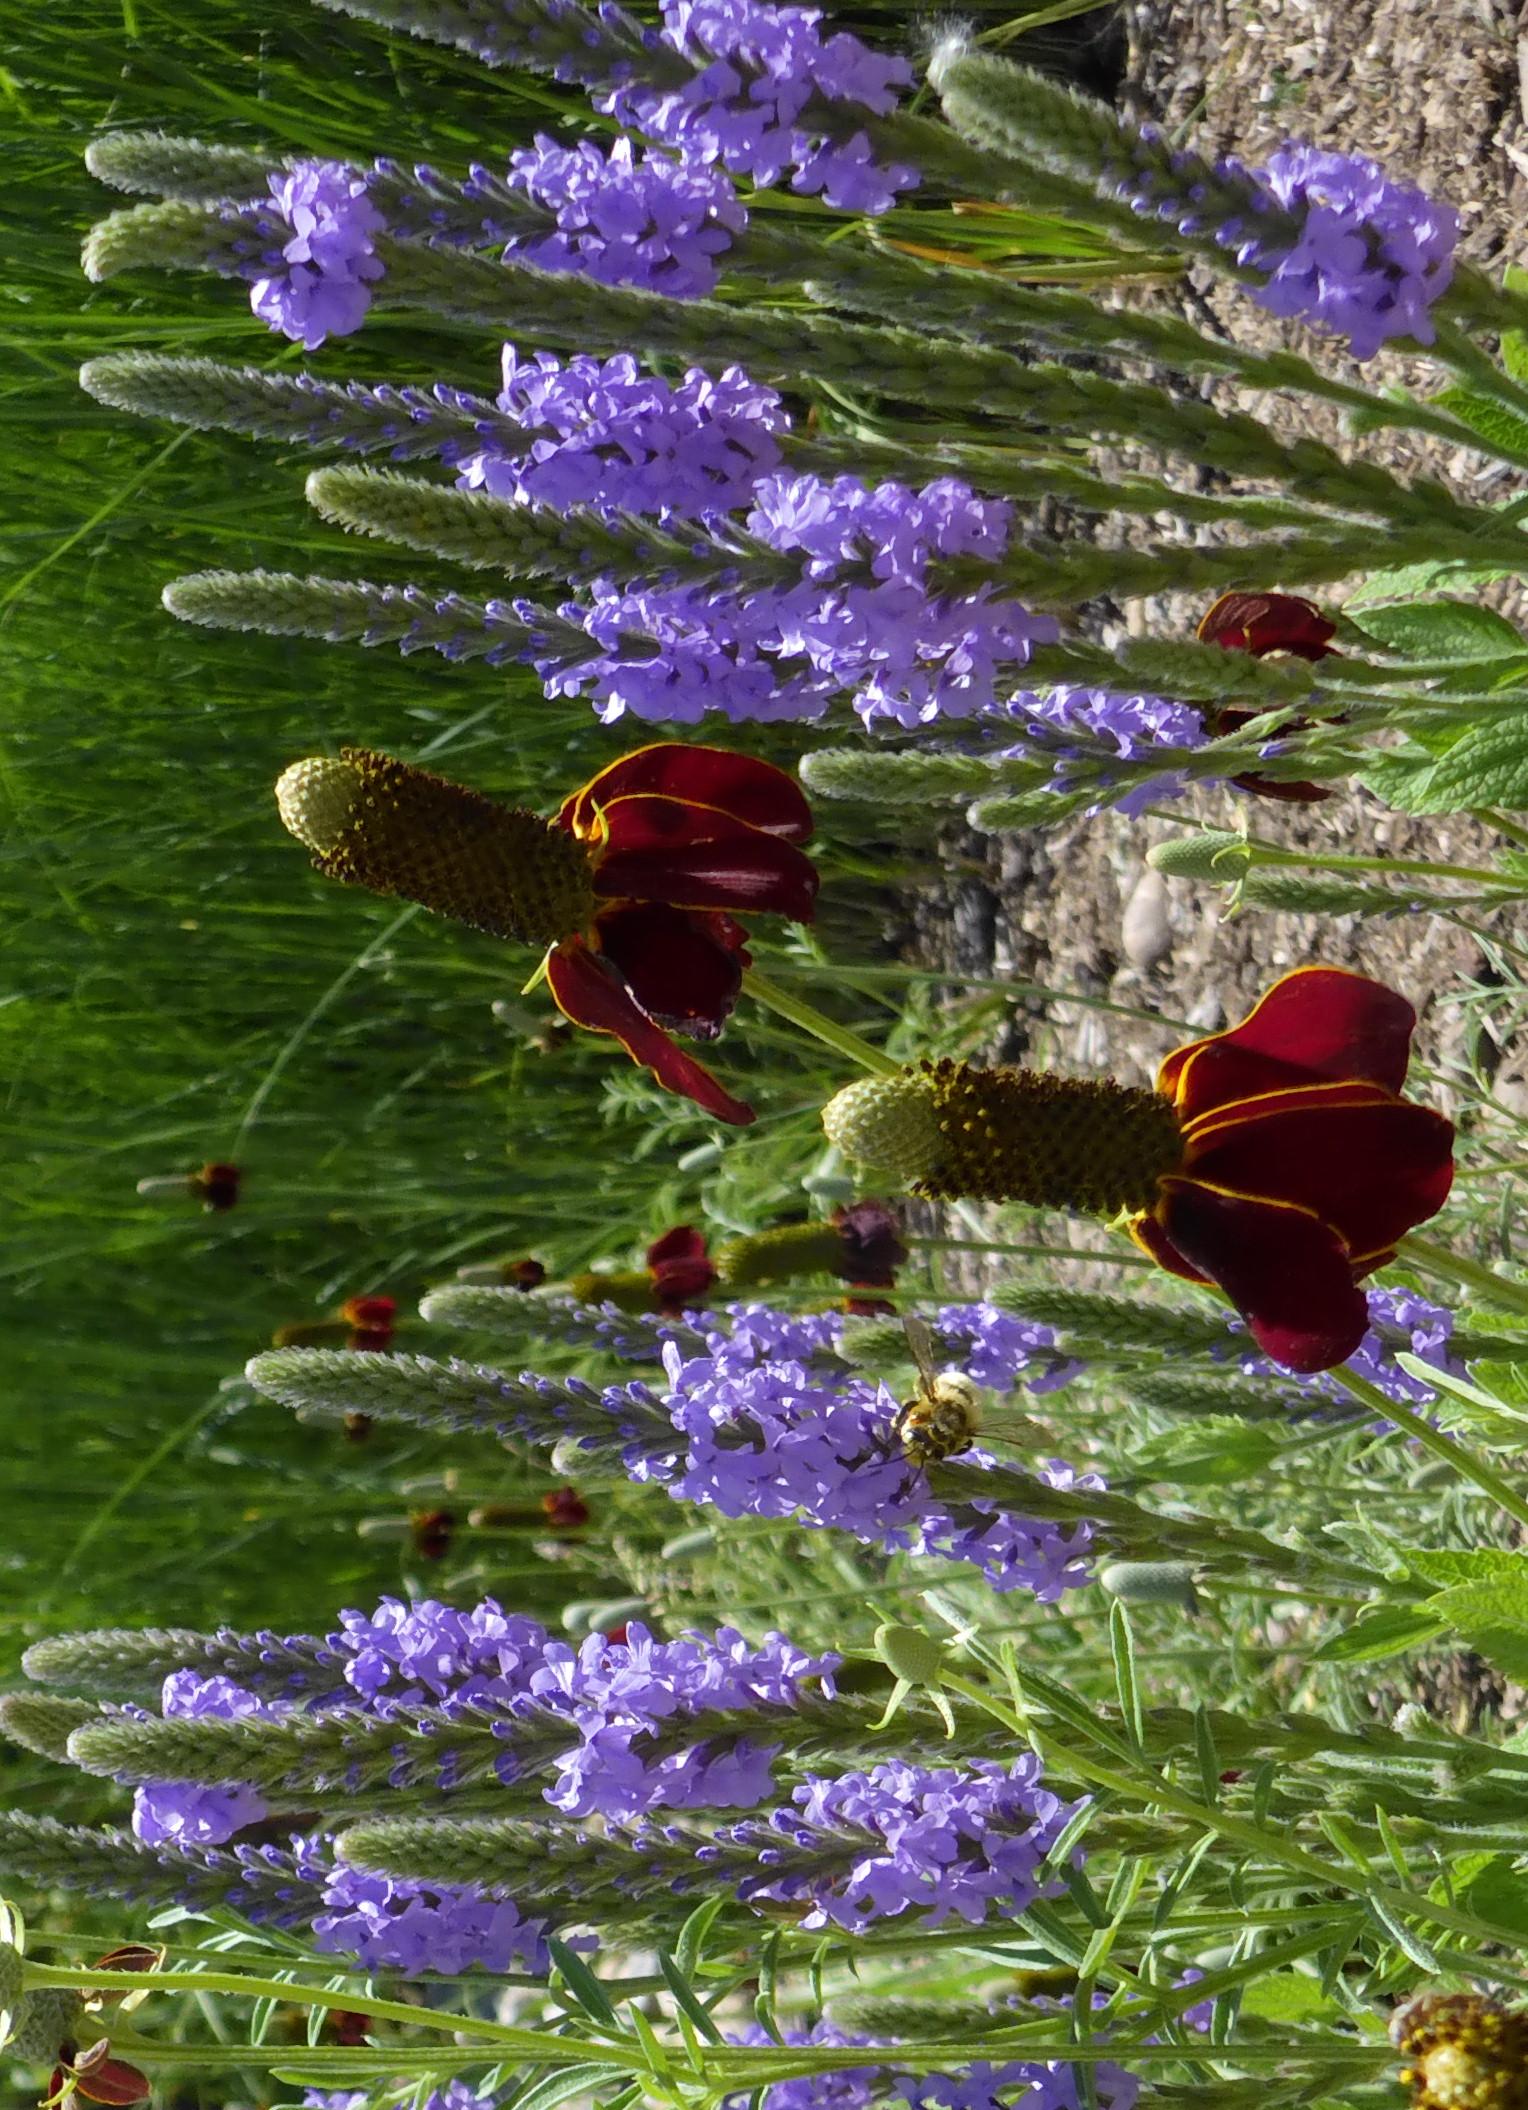 Summer rains boost native species